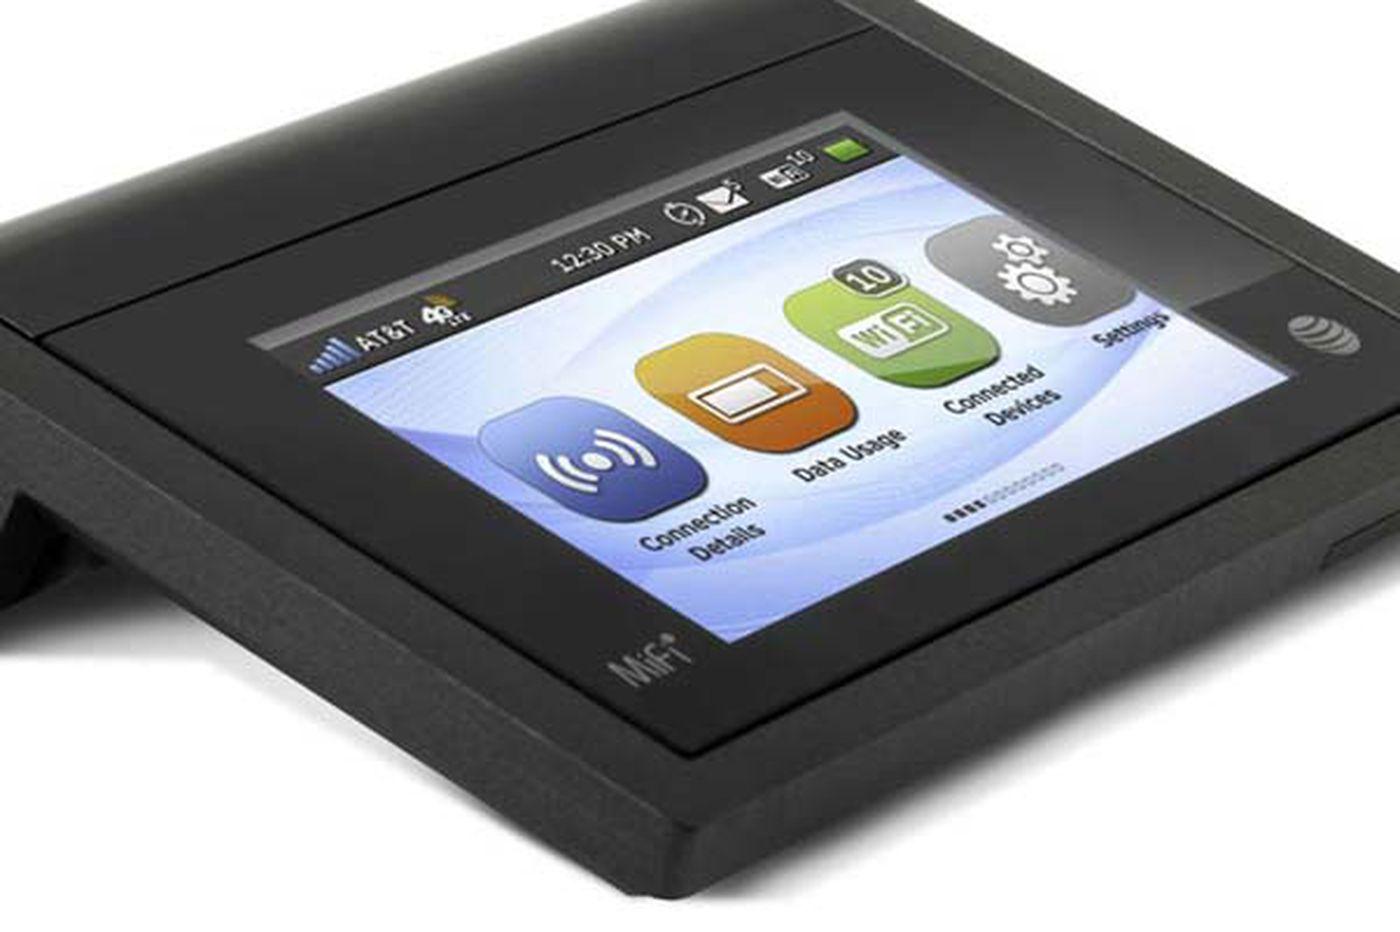 Wi-Fi widgets make homes free-range